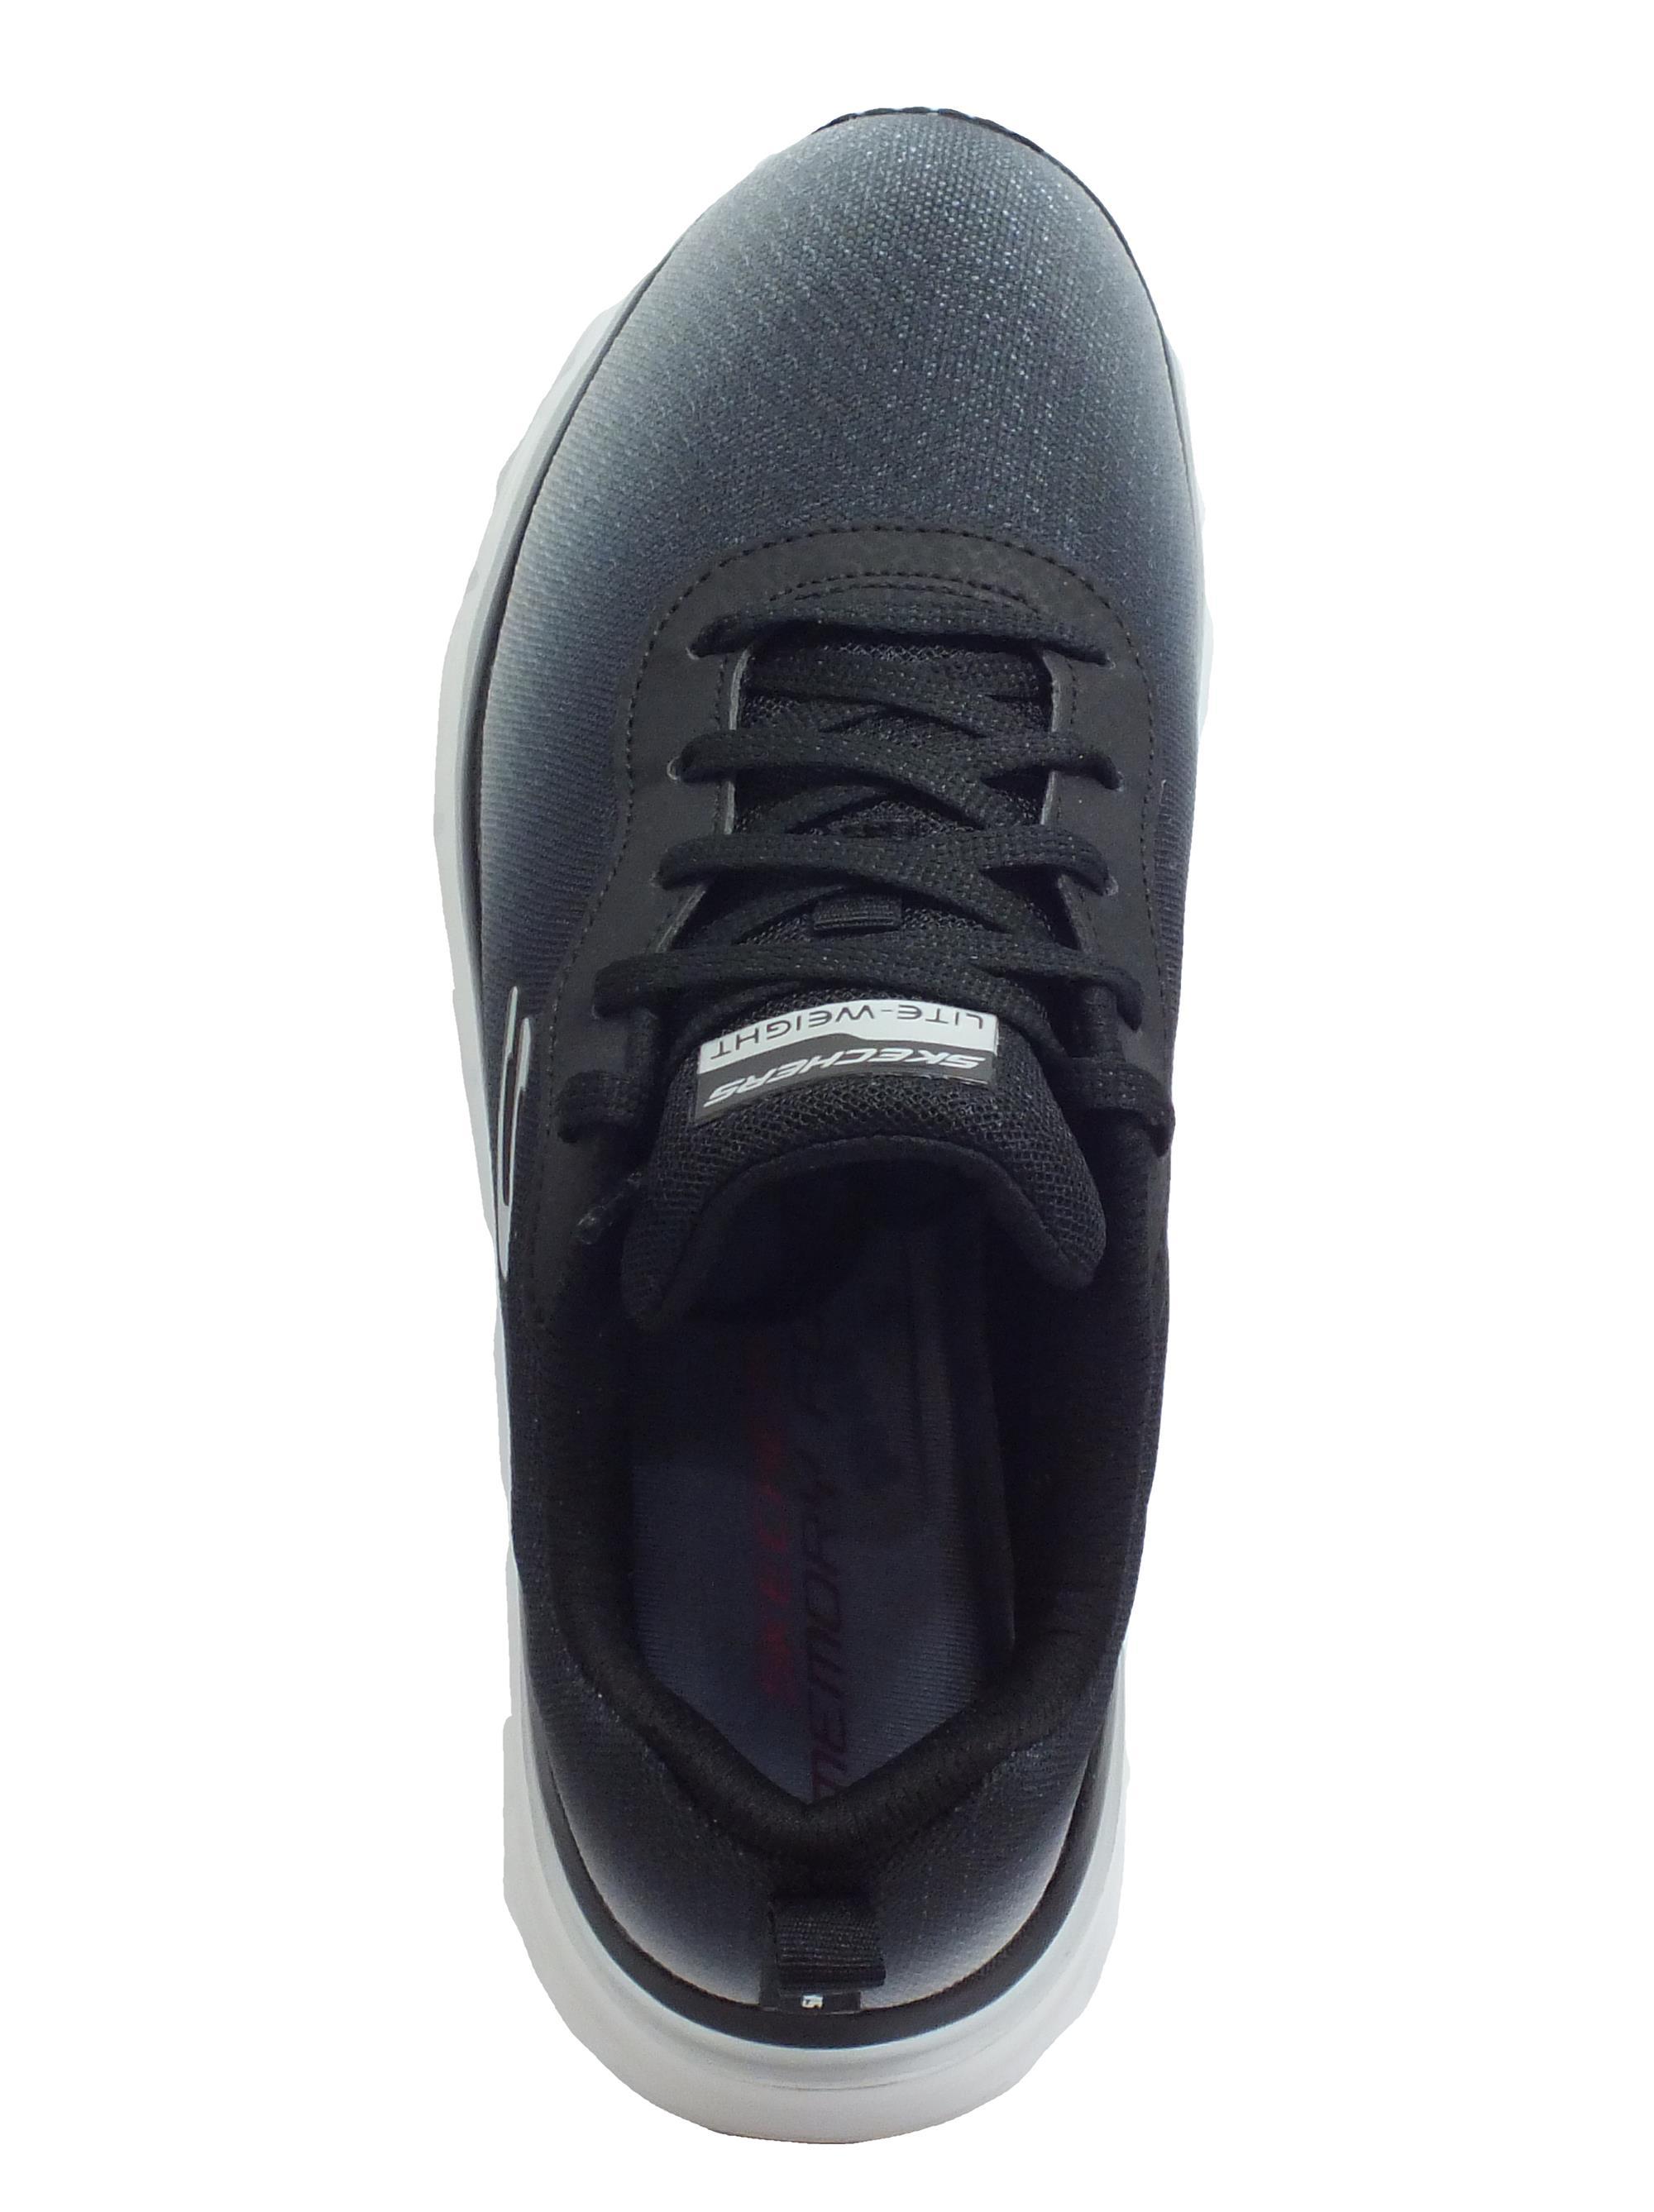 Skechers 12717BKW Fashion Fit Build Up Black White Scarpe